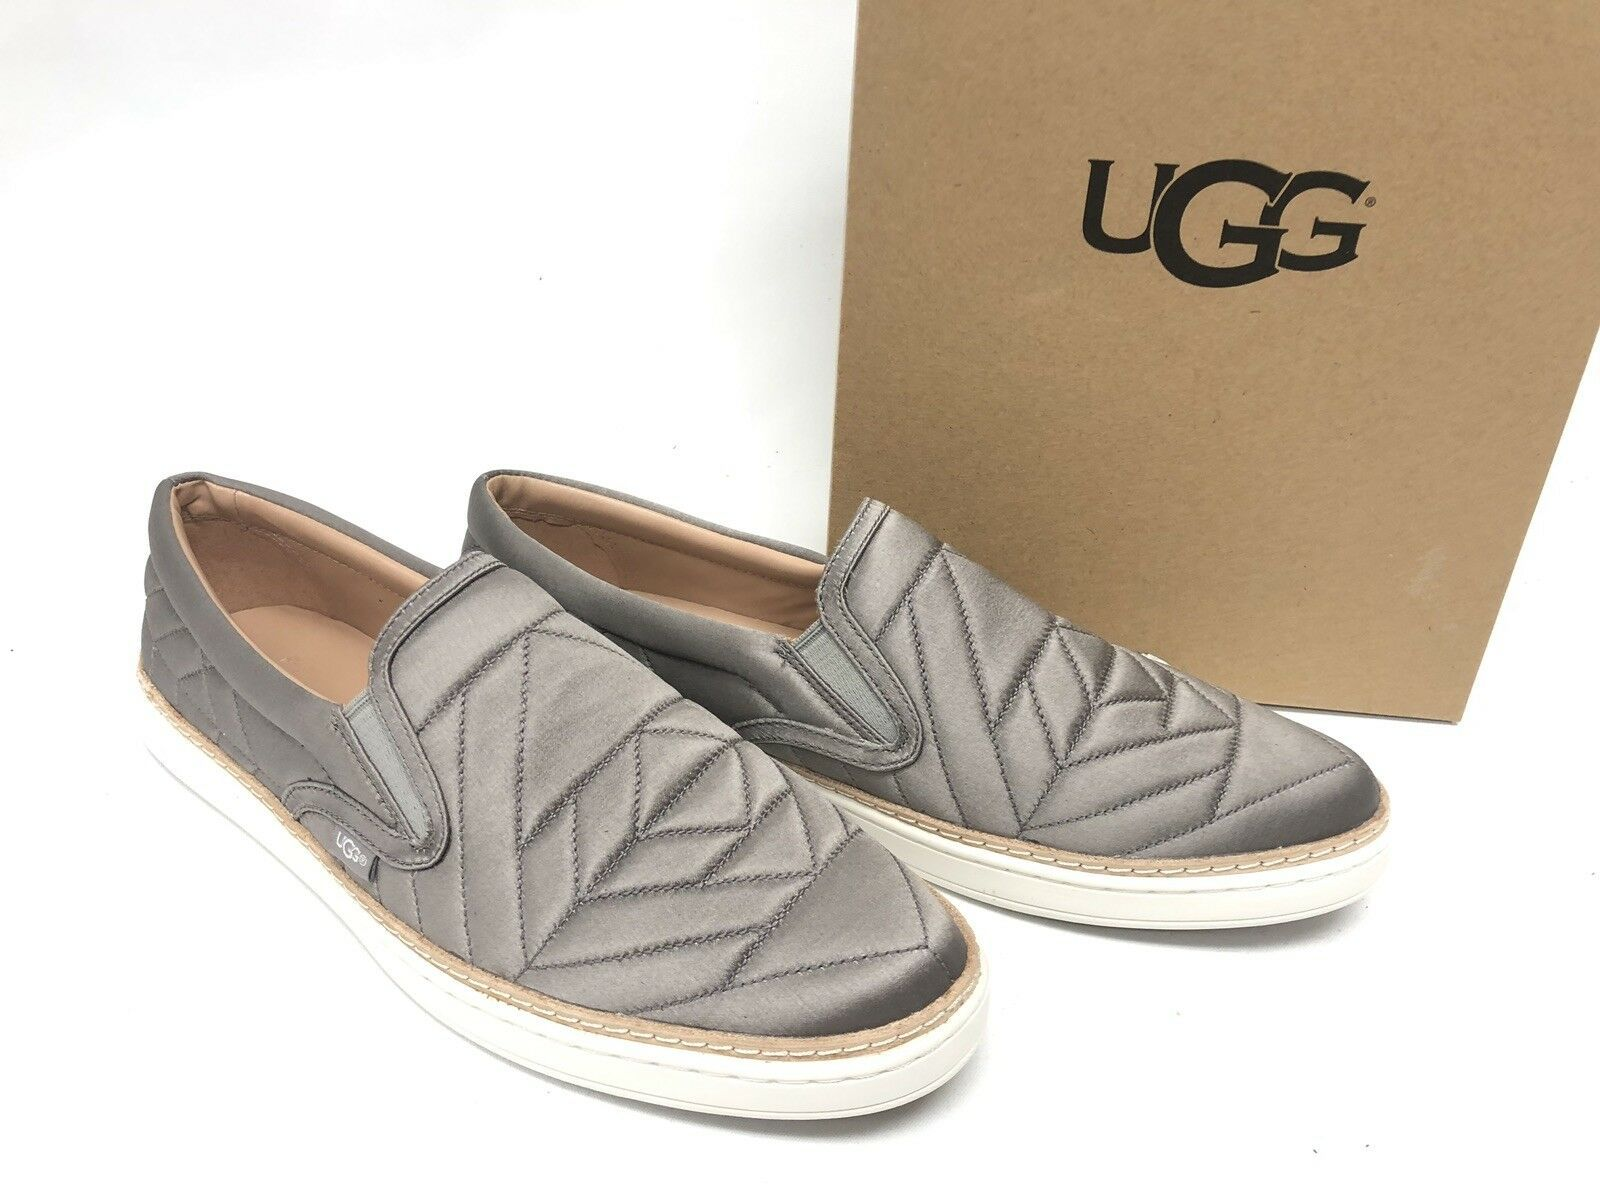 Ugg Australia Soleda Quilted Sneaker Elephant Gray Grey 1095533 Shoes Women's